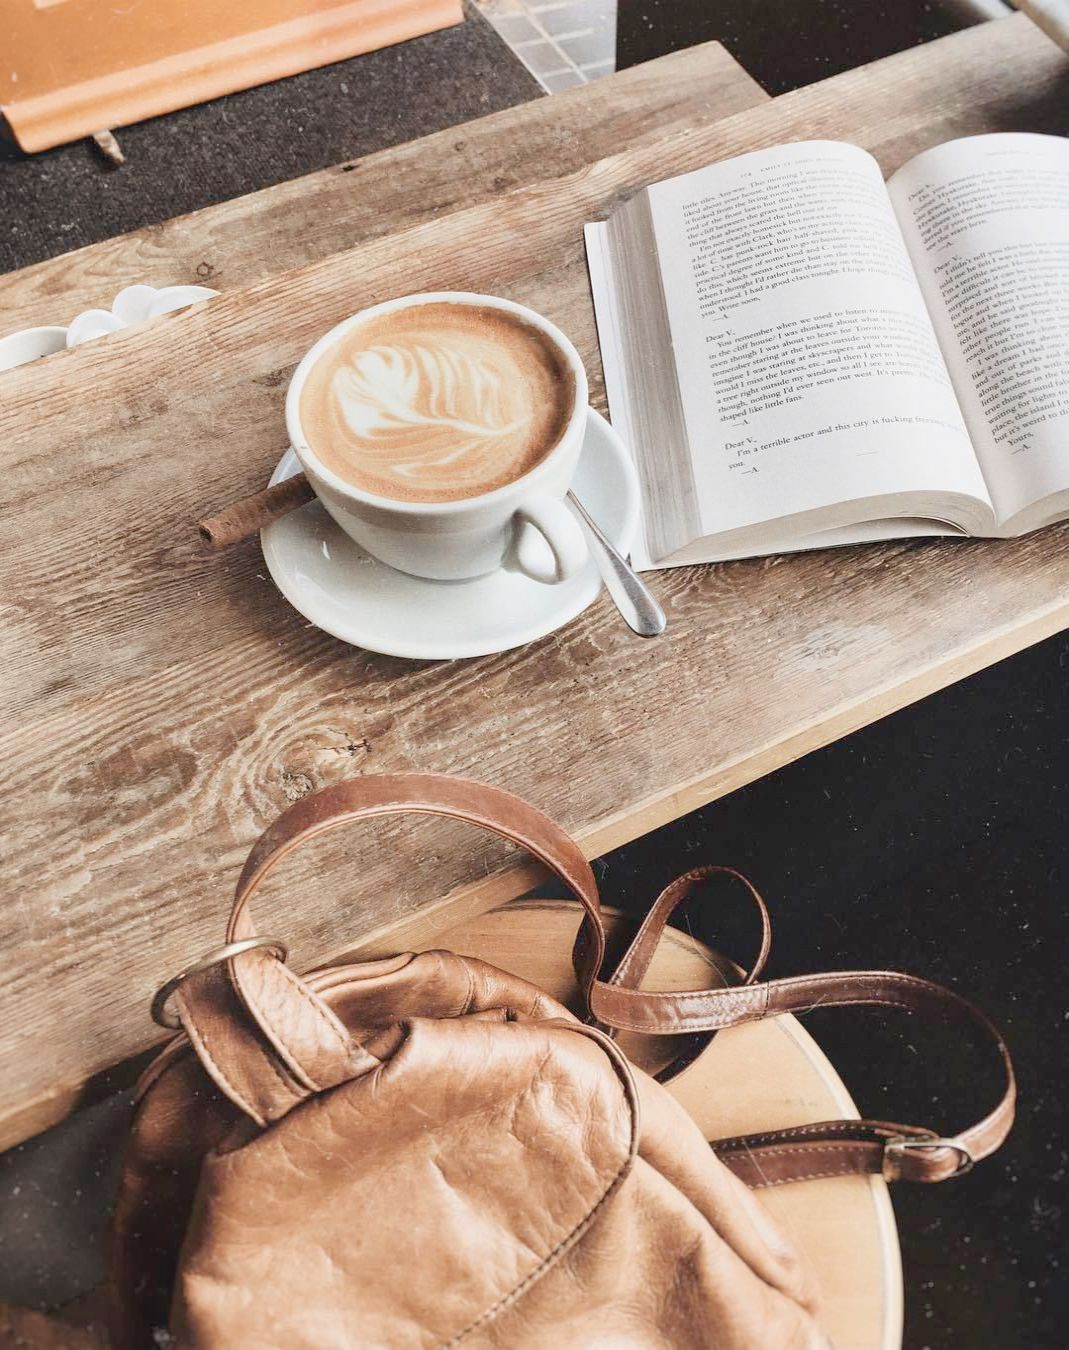 Coffee Shop Ktown Their Coffee Bean And Tea Leaf Instagram Your Coffee Bean And Tea Leaf Claremont Opposite Cof Coffee And Books Coffee Photography Coffee Love